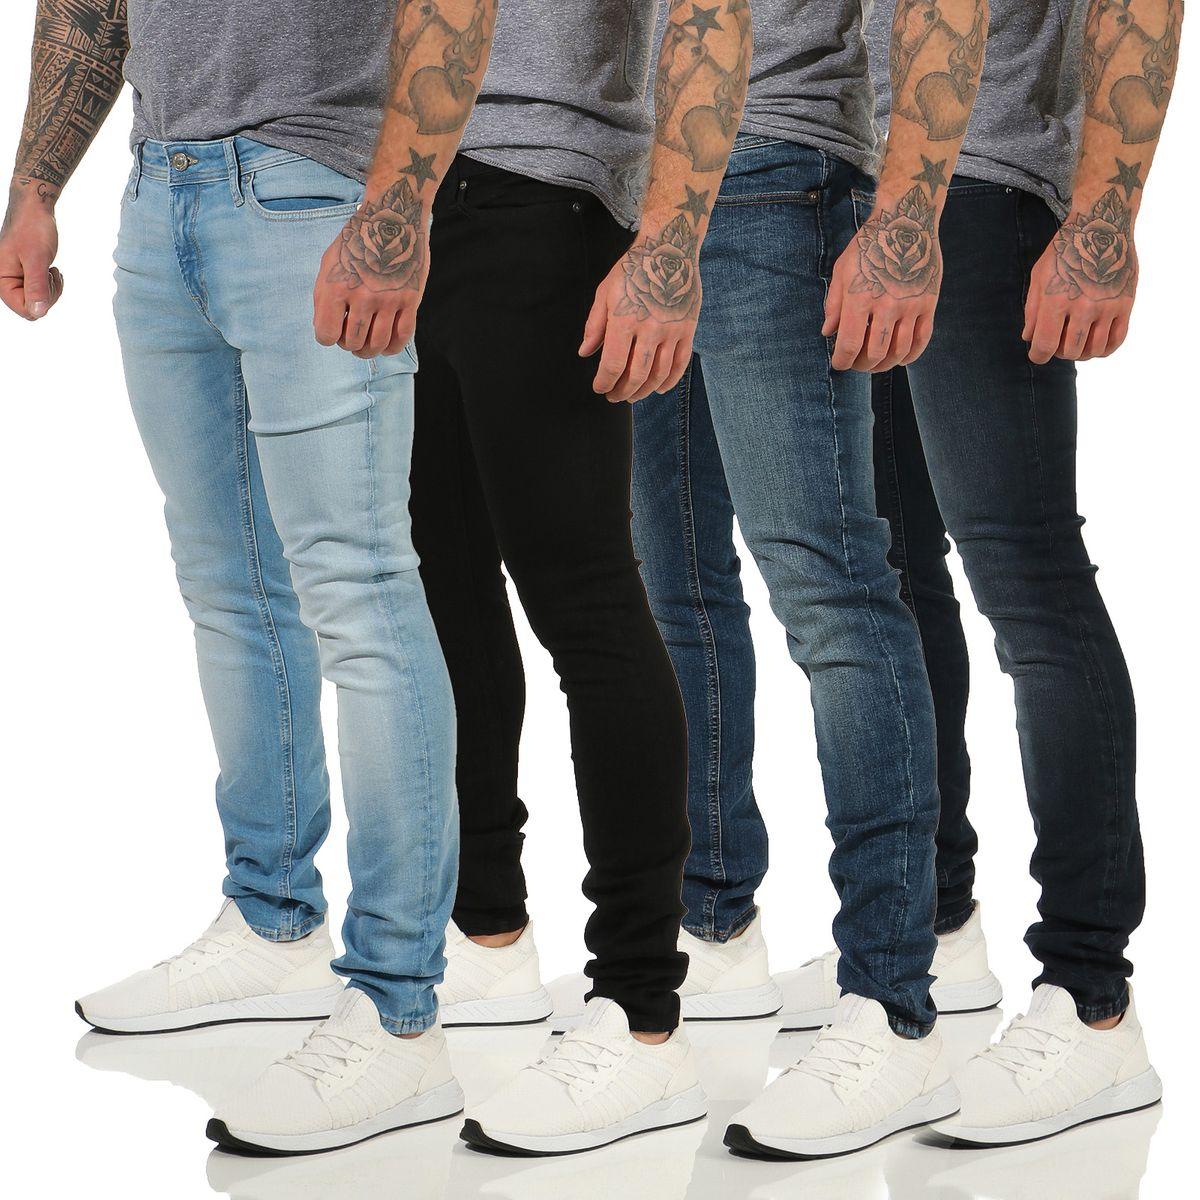 Jack /& Jones Herren Jeans jjiLIAM 014 in Dunkelblau